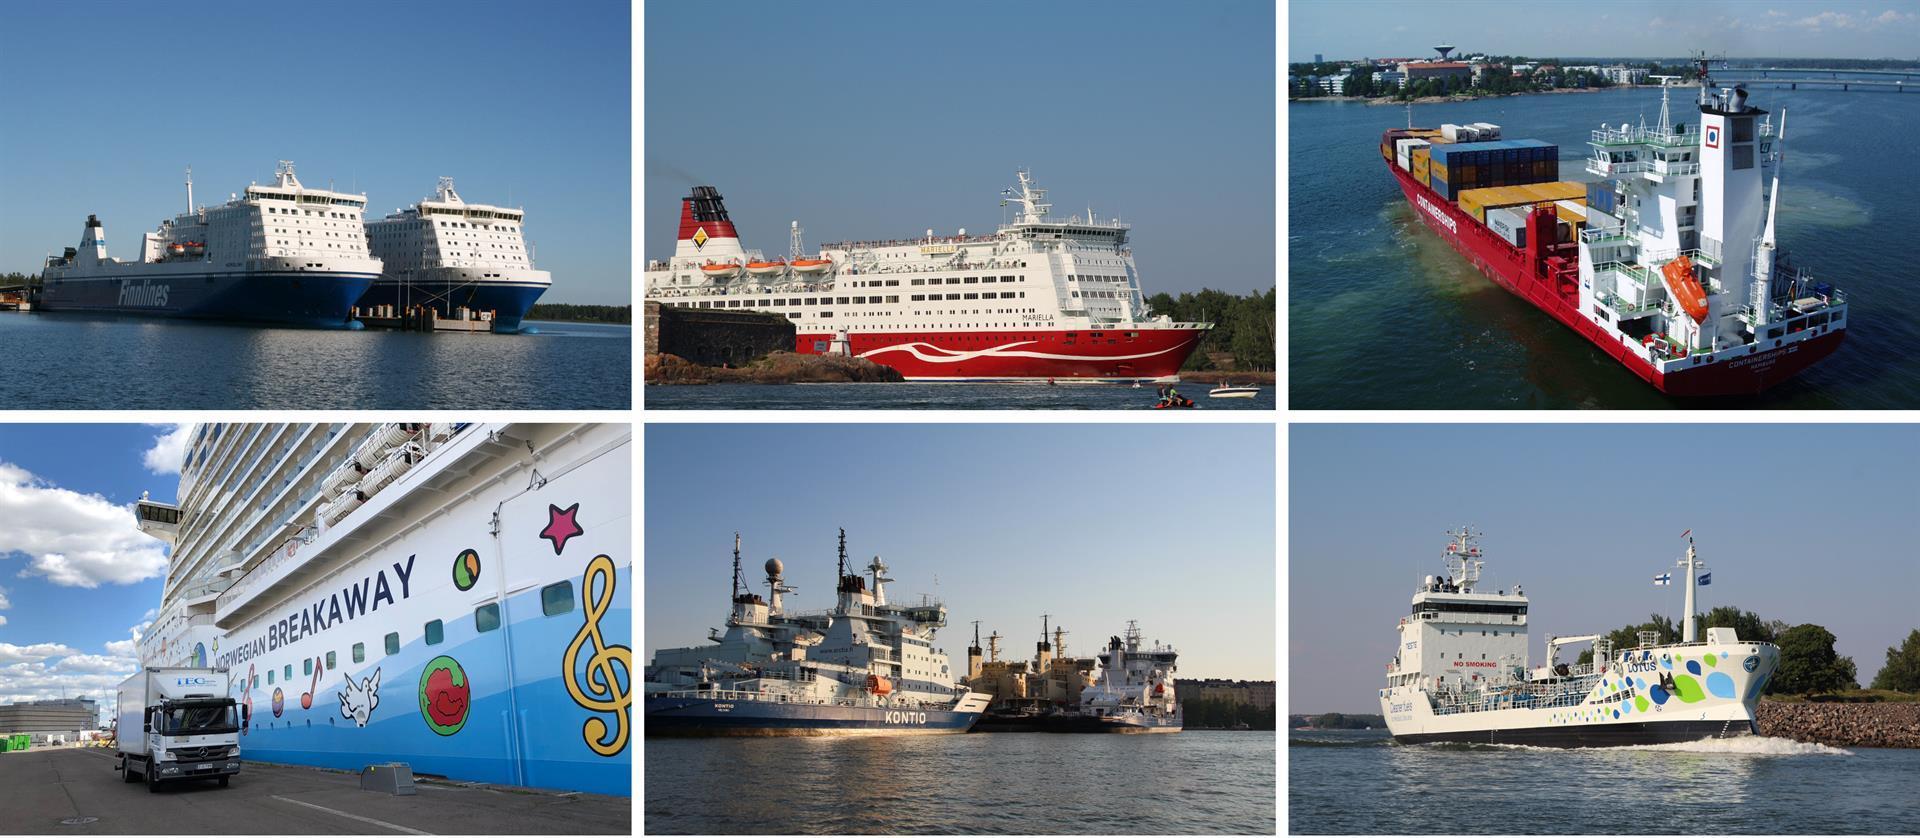 Finnlines, Viking Line M/S Mariella, Containerships, Norwegian Breakaway, Kontio, Lotus